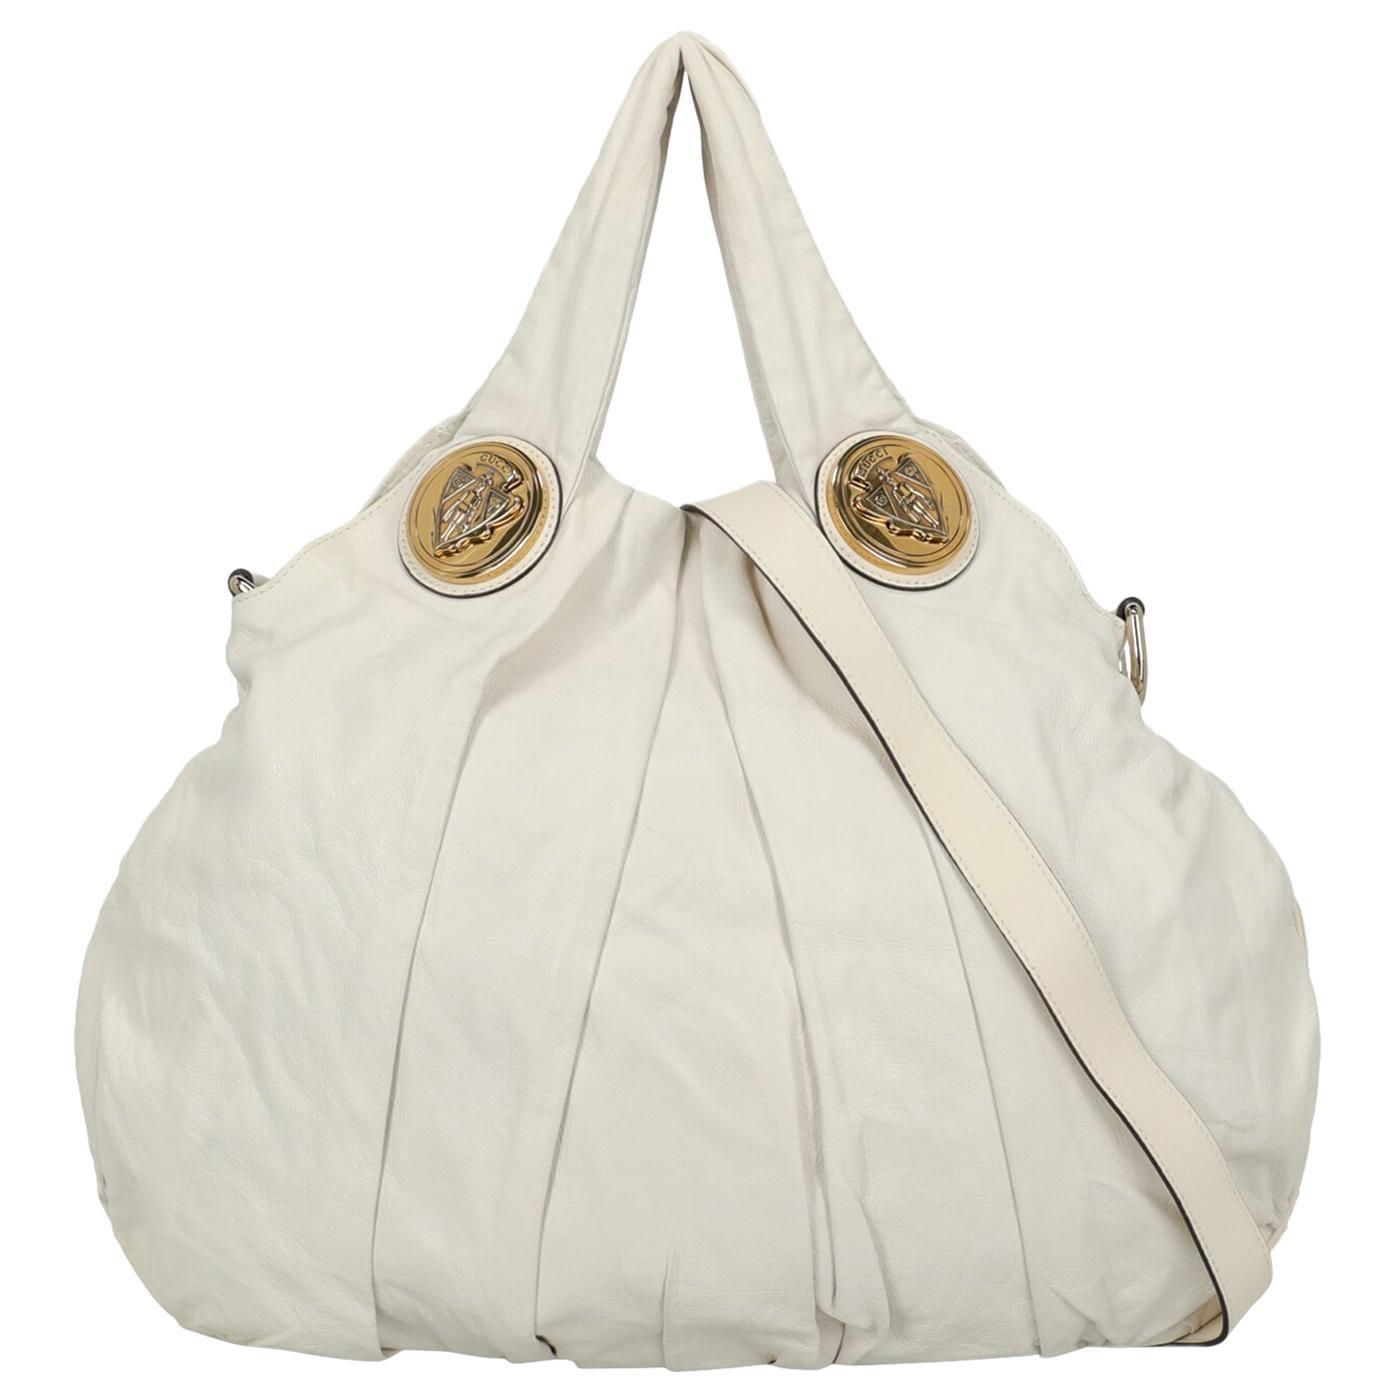 Gucci Woman Handbag White